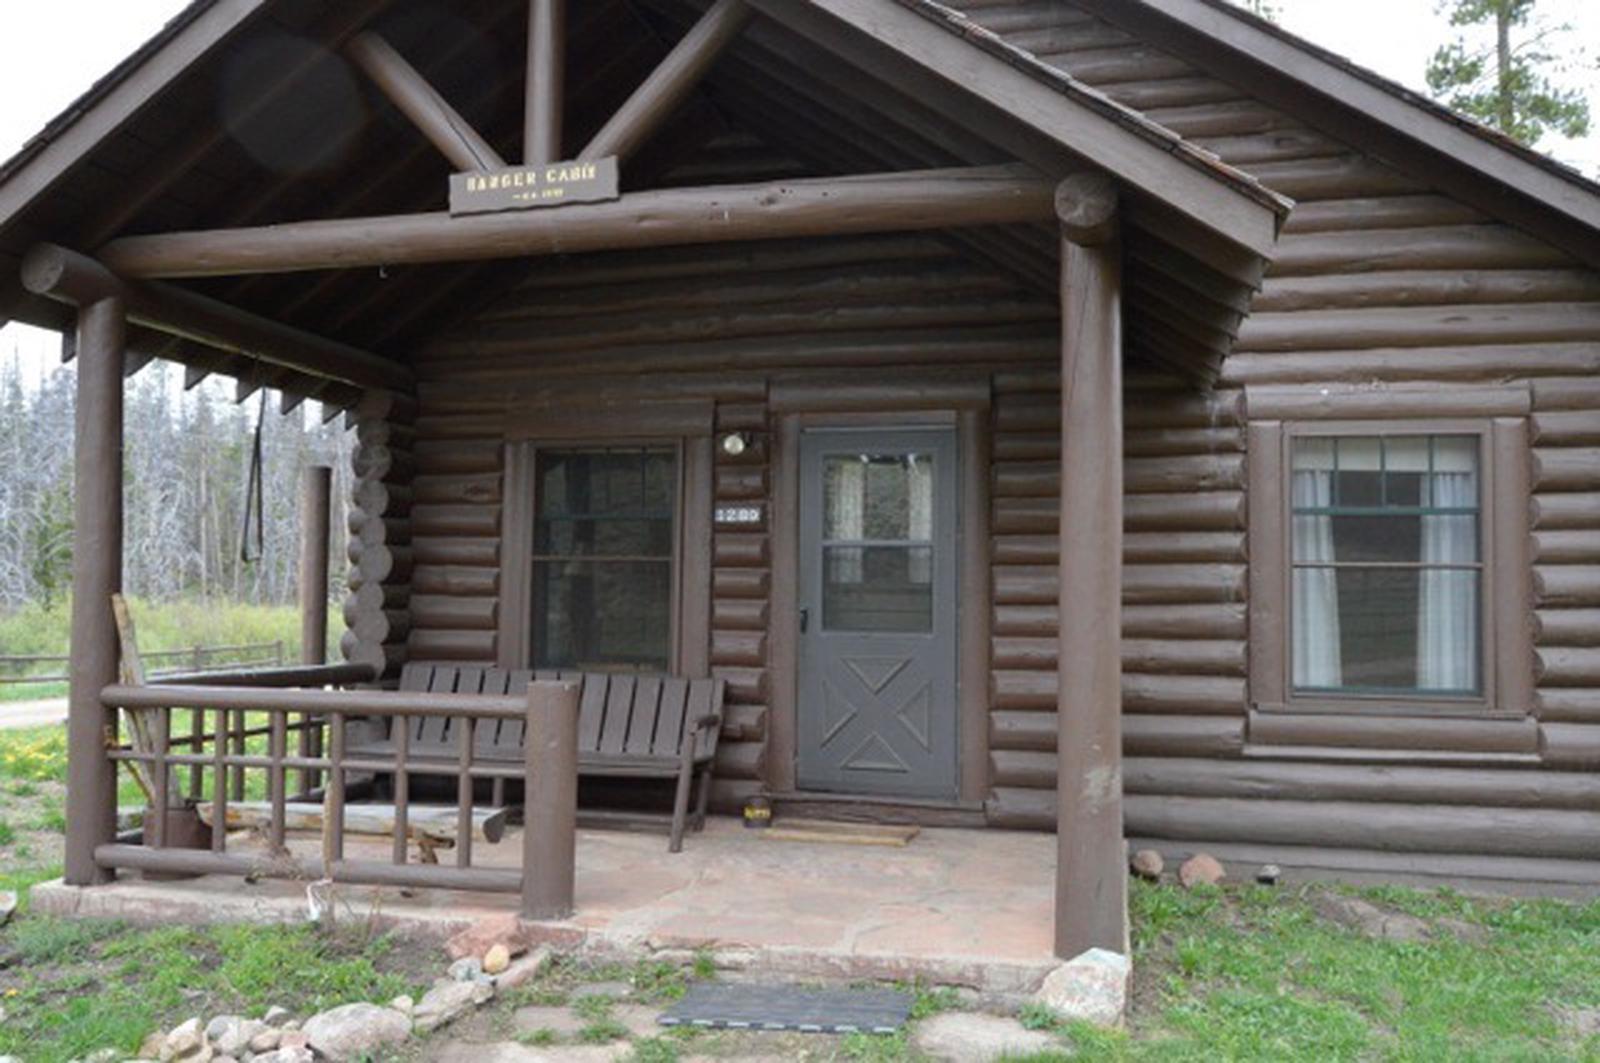 Stub Creek cabin porch